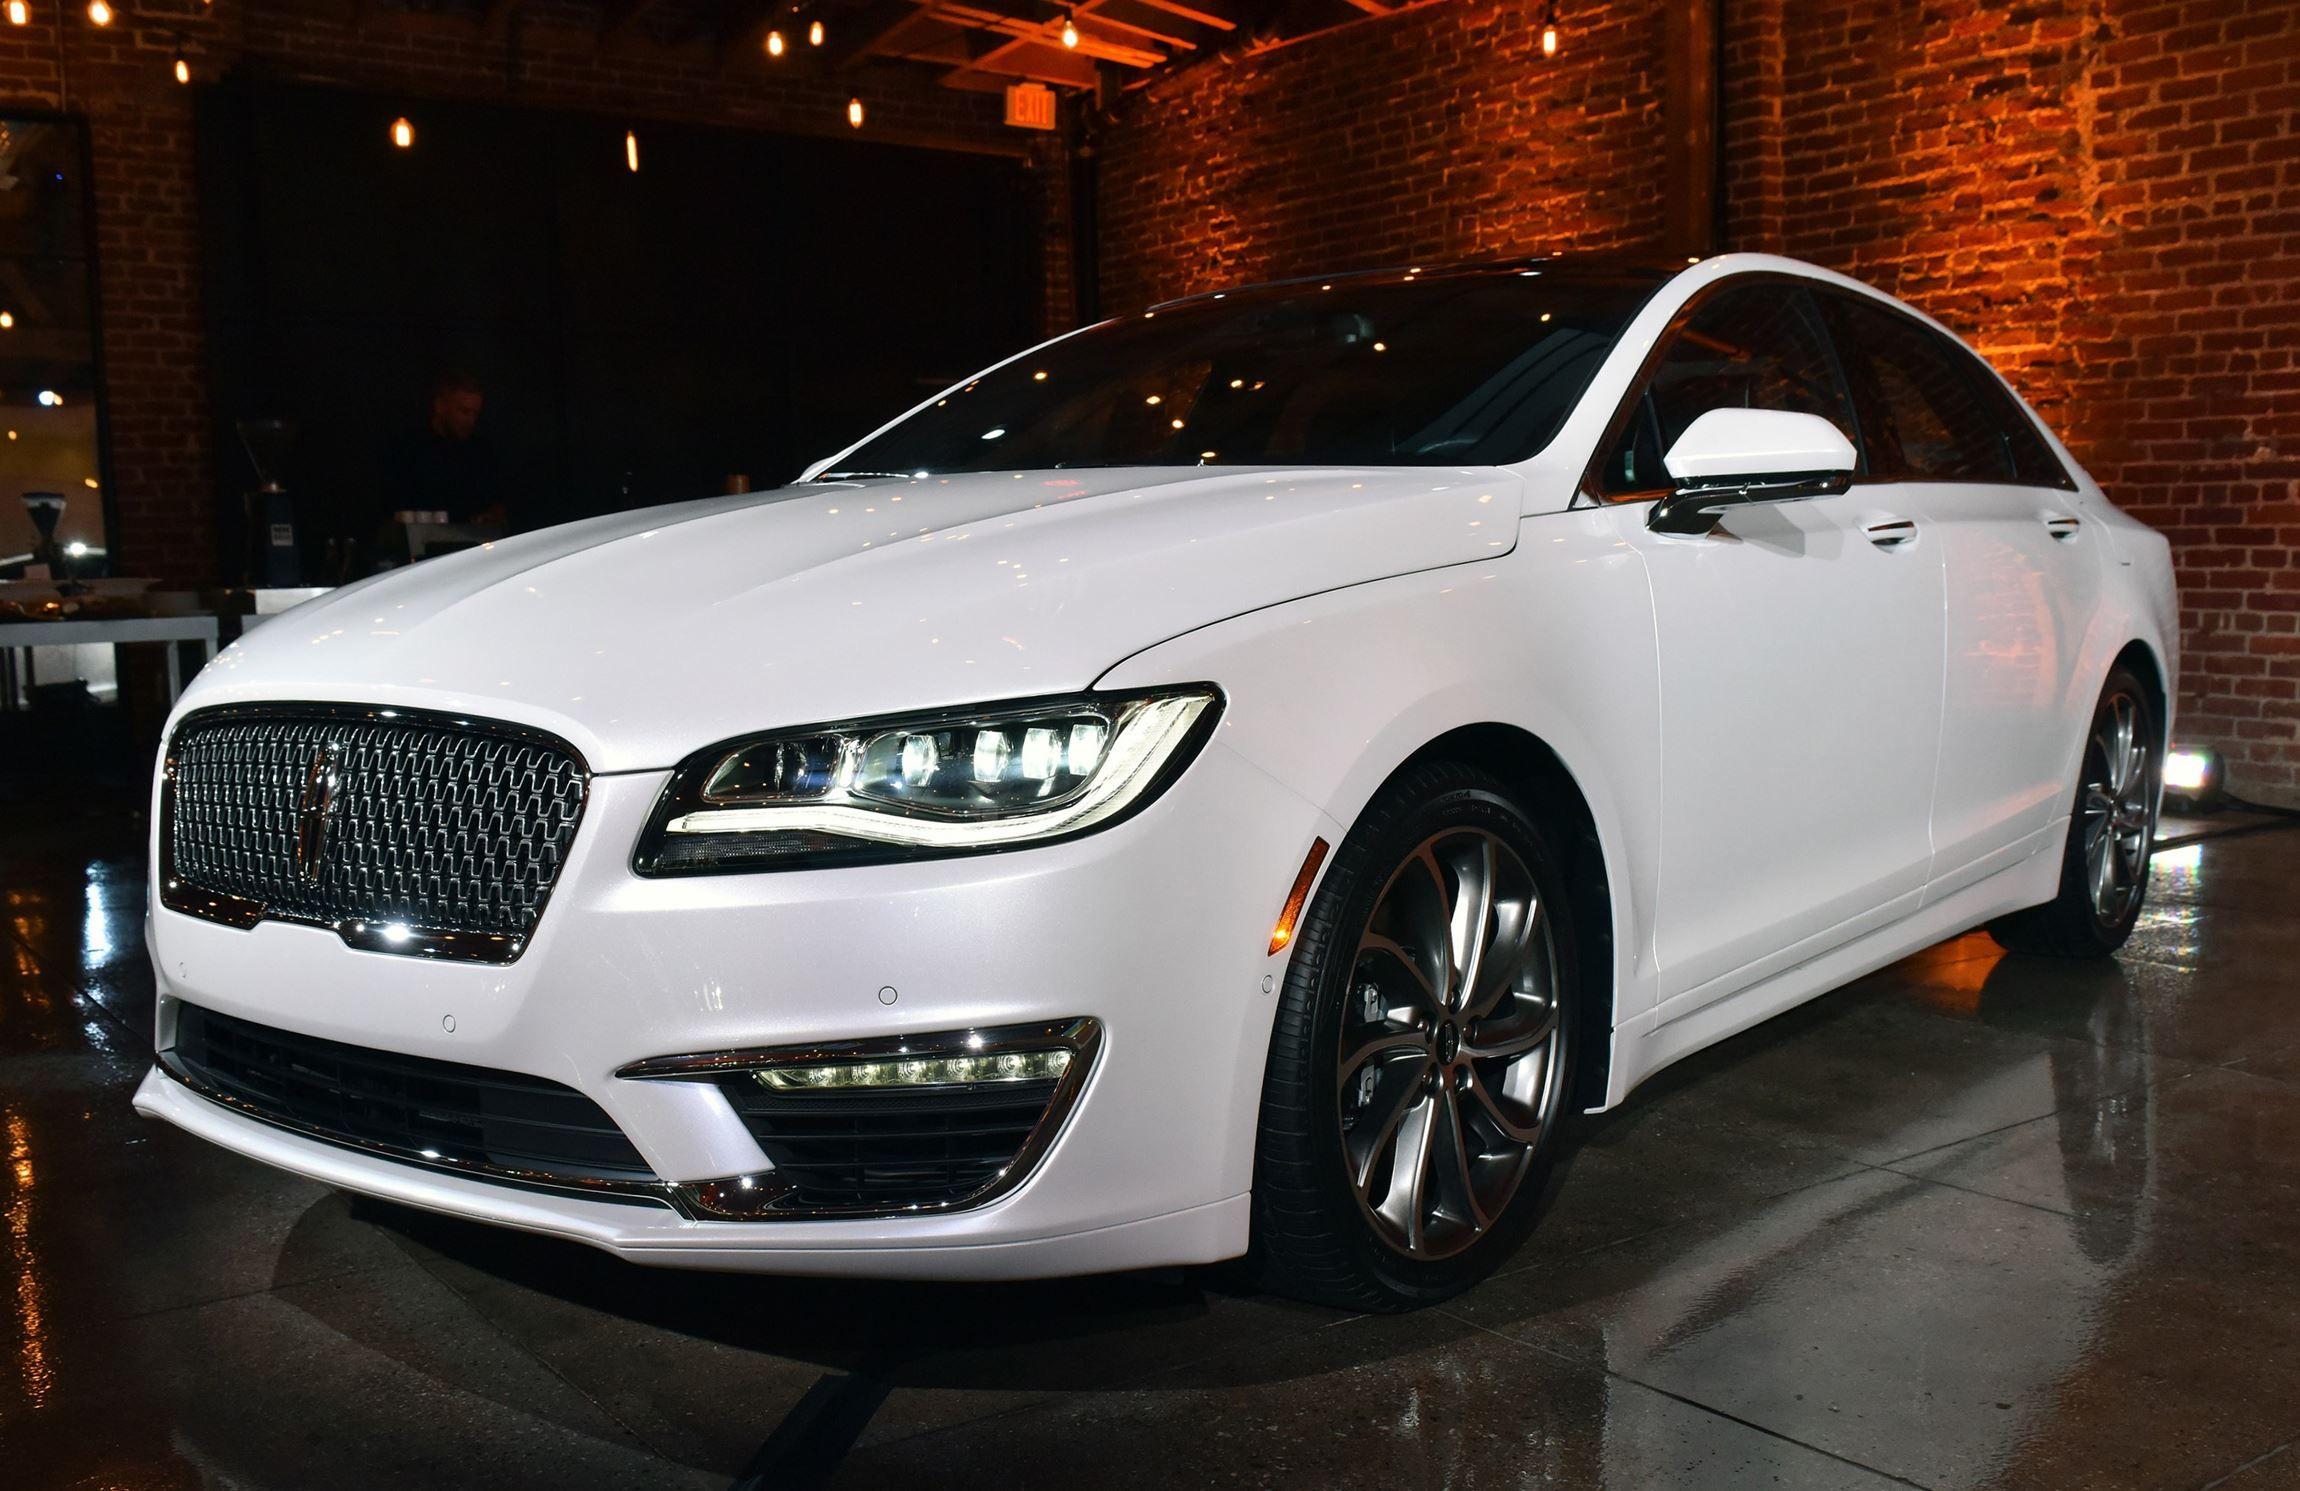 25 Melhores Ideias De Lincoln Mkz No Pinterest Lincoln Continental Carros Continentais E